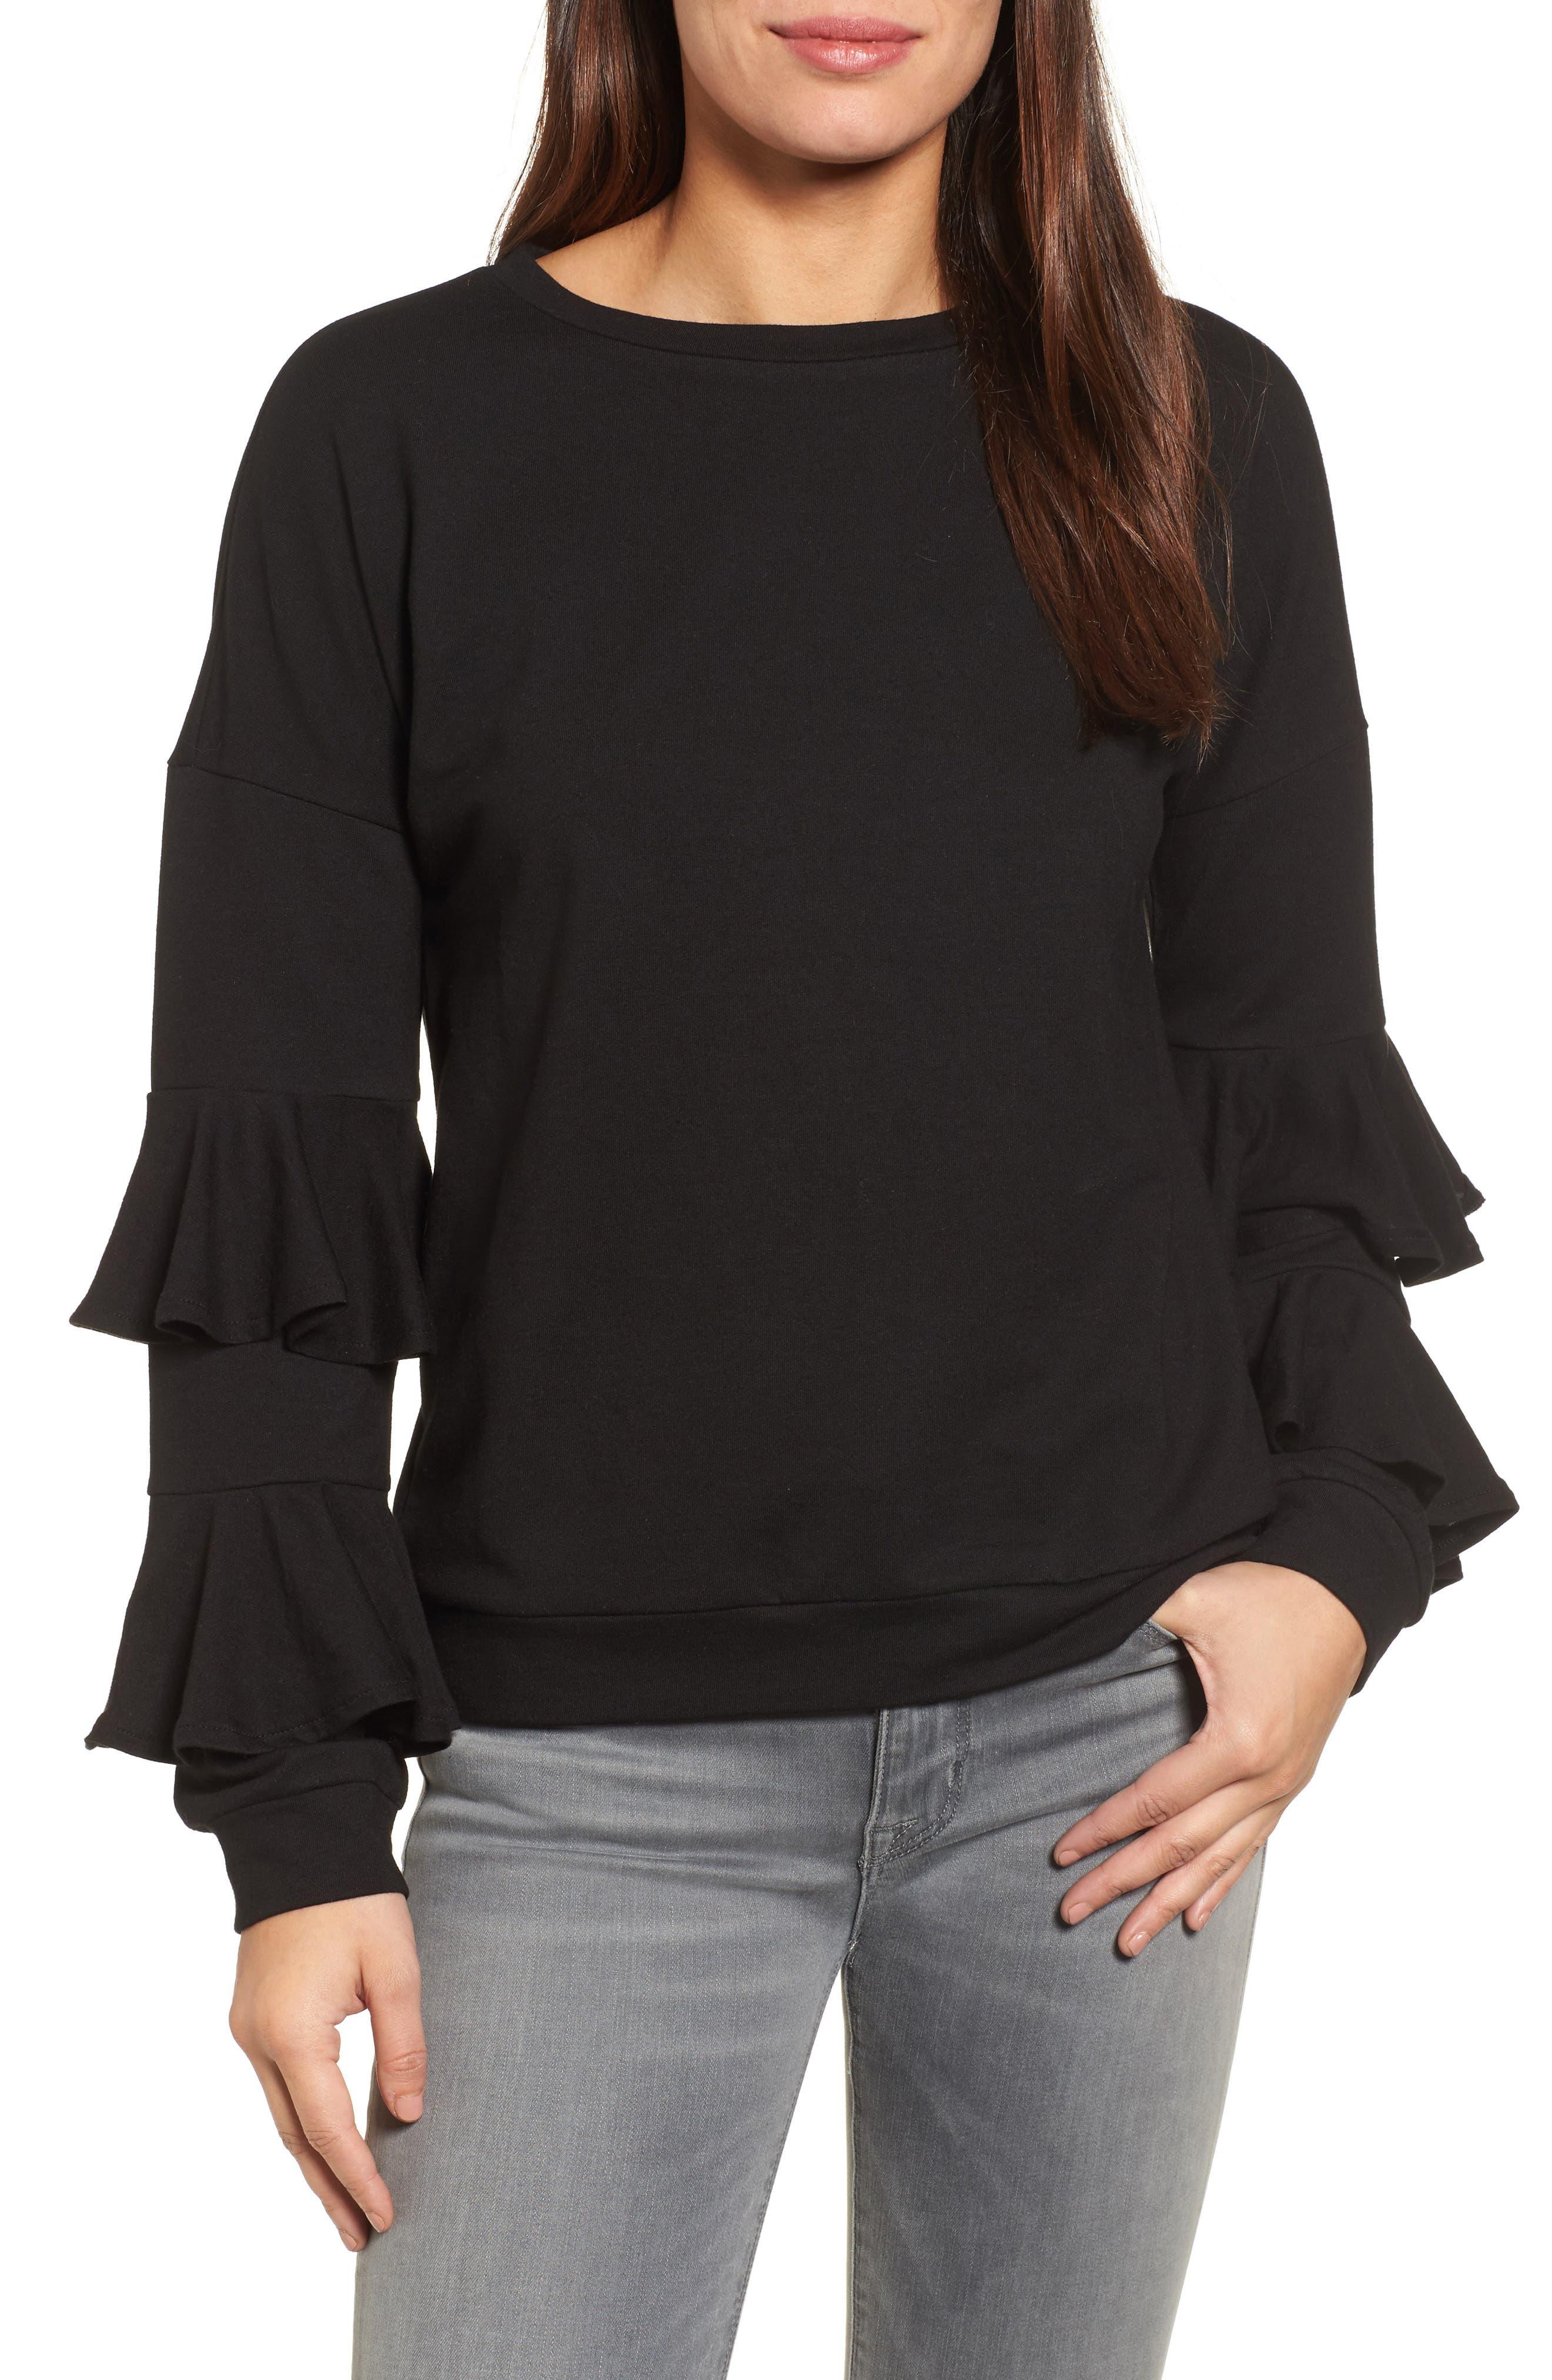 Alternate Image 1 Selected - Halogen® Ruffle Sleeve Sweatshirt (Regular & Petite)